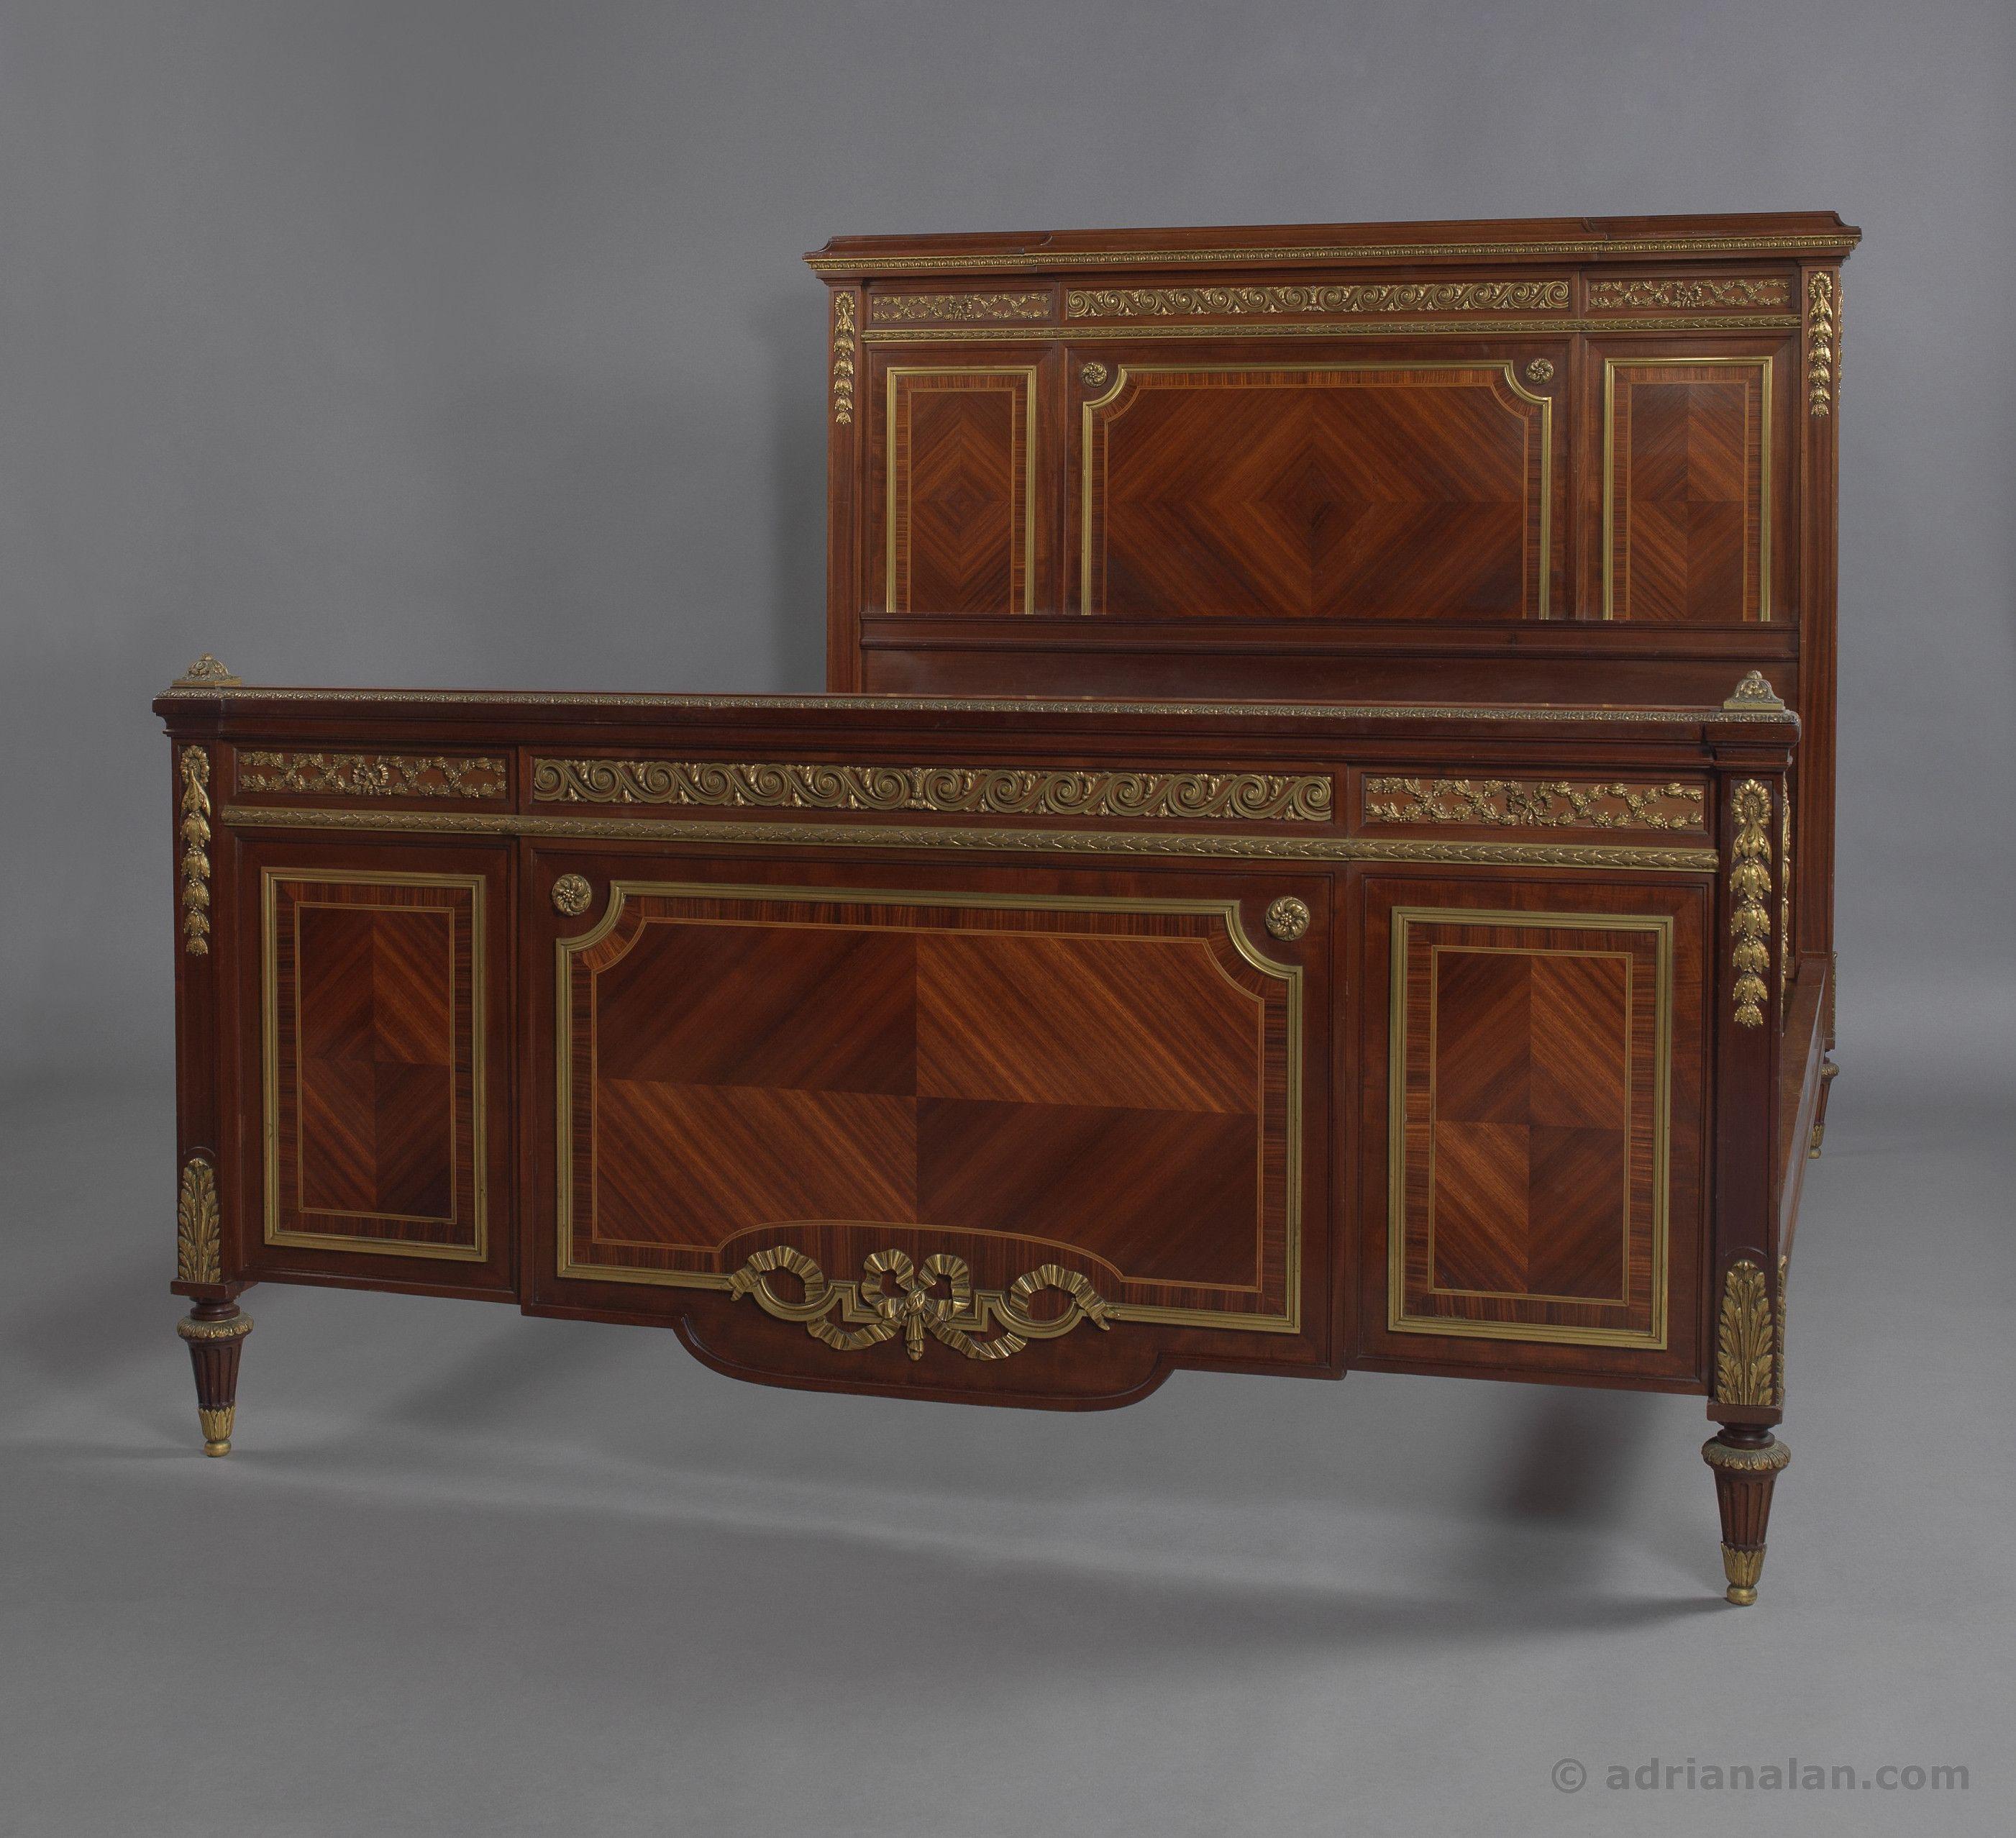 Antiques Antique french furniture, Antique bedroom